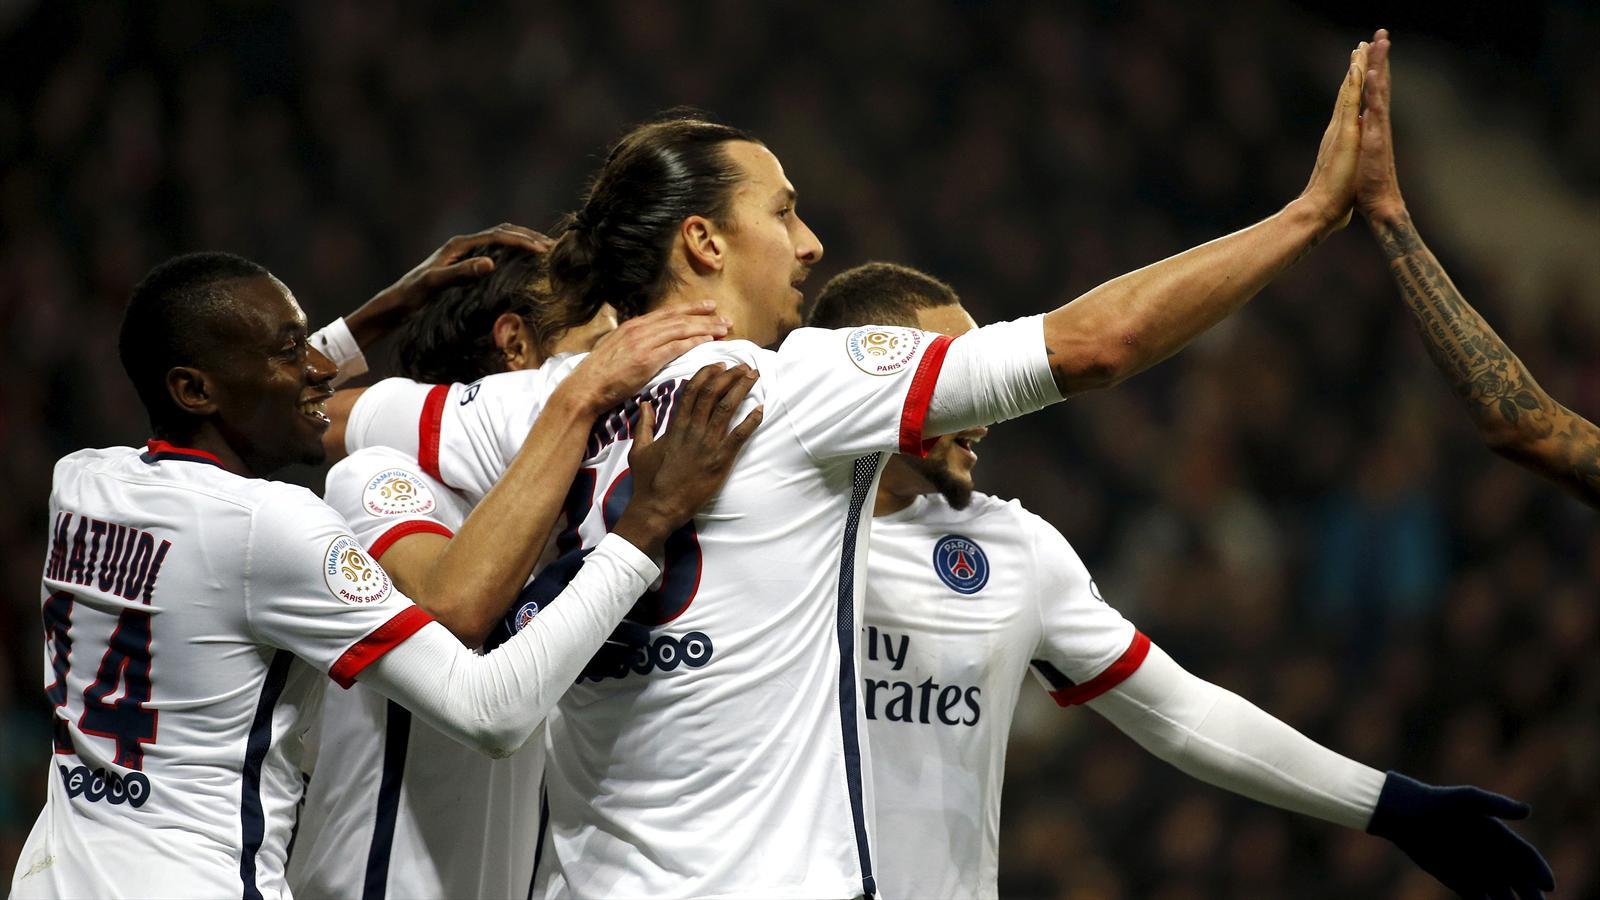 Paris St Germain's Zlatan Ibrahimovic (C) reacts after scoring against Nice